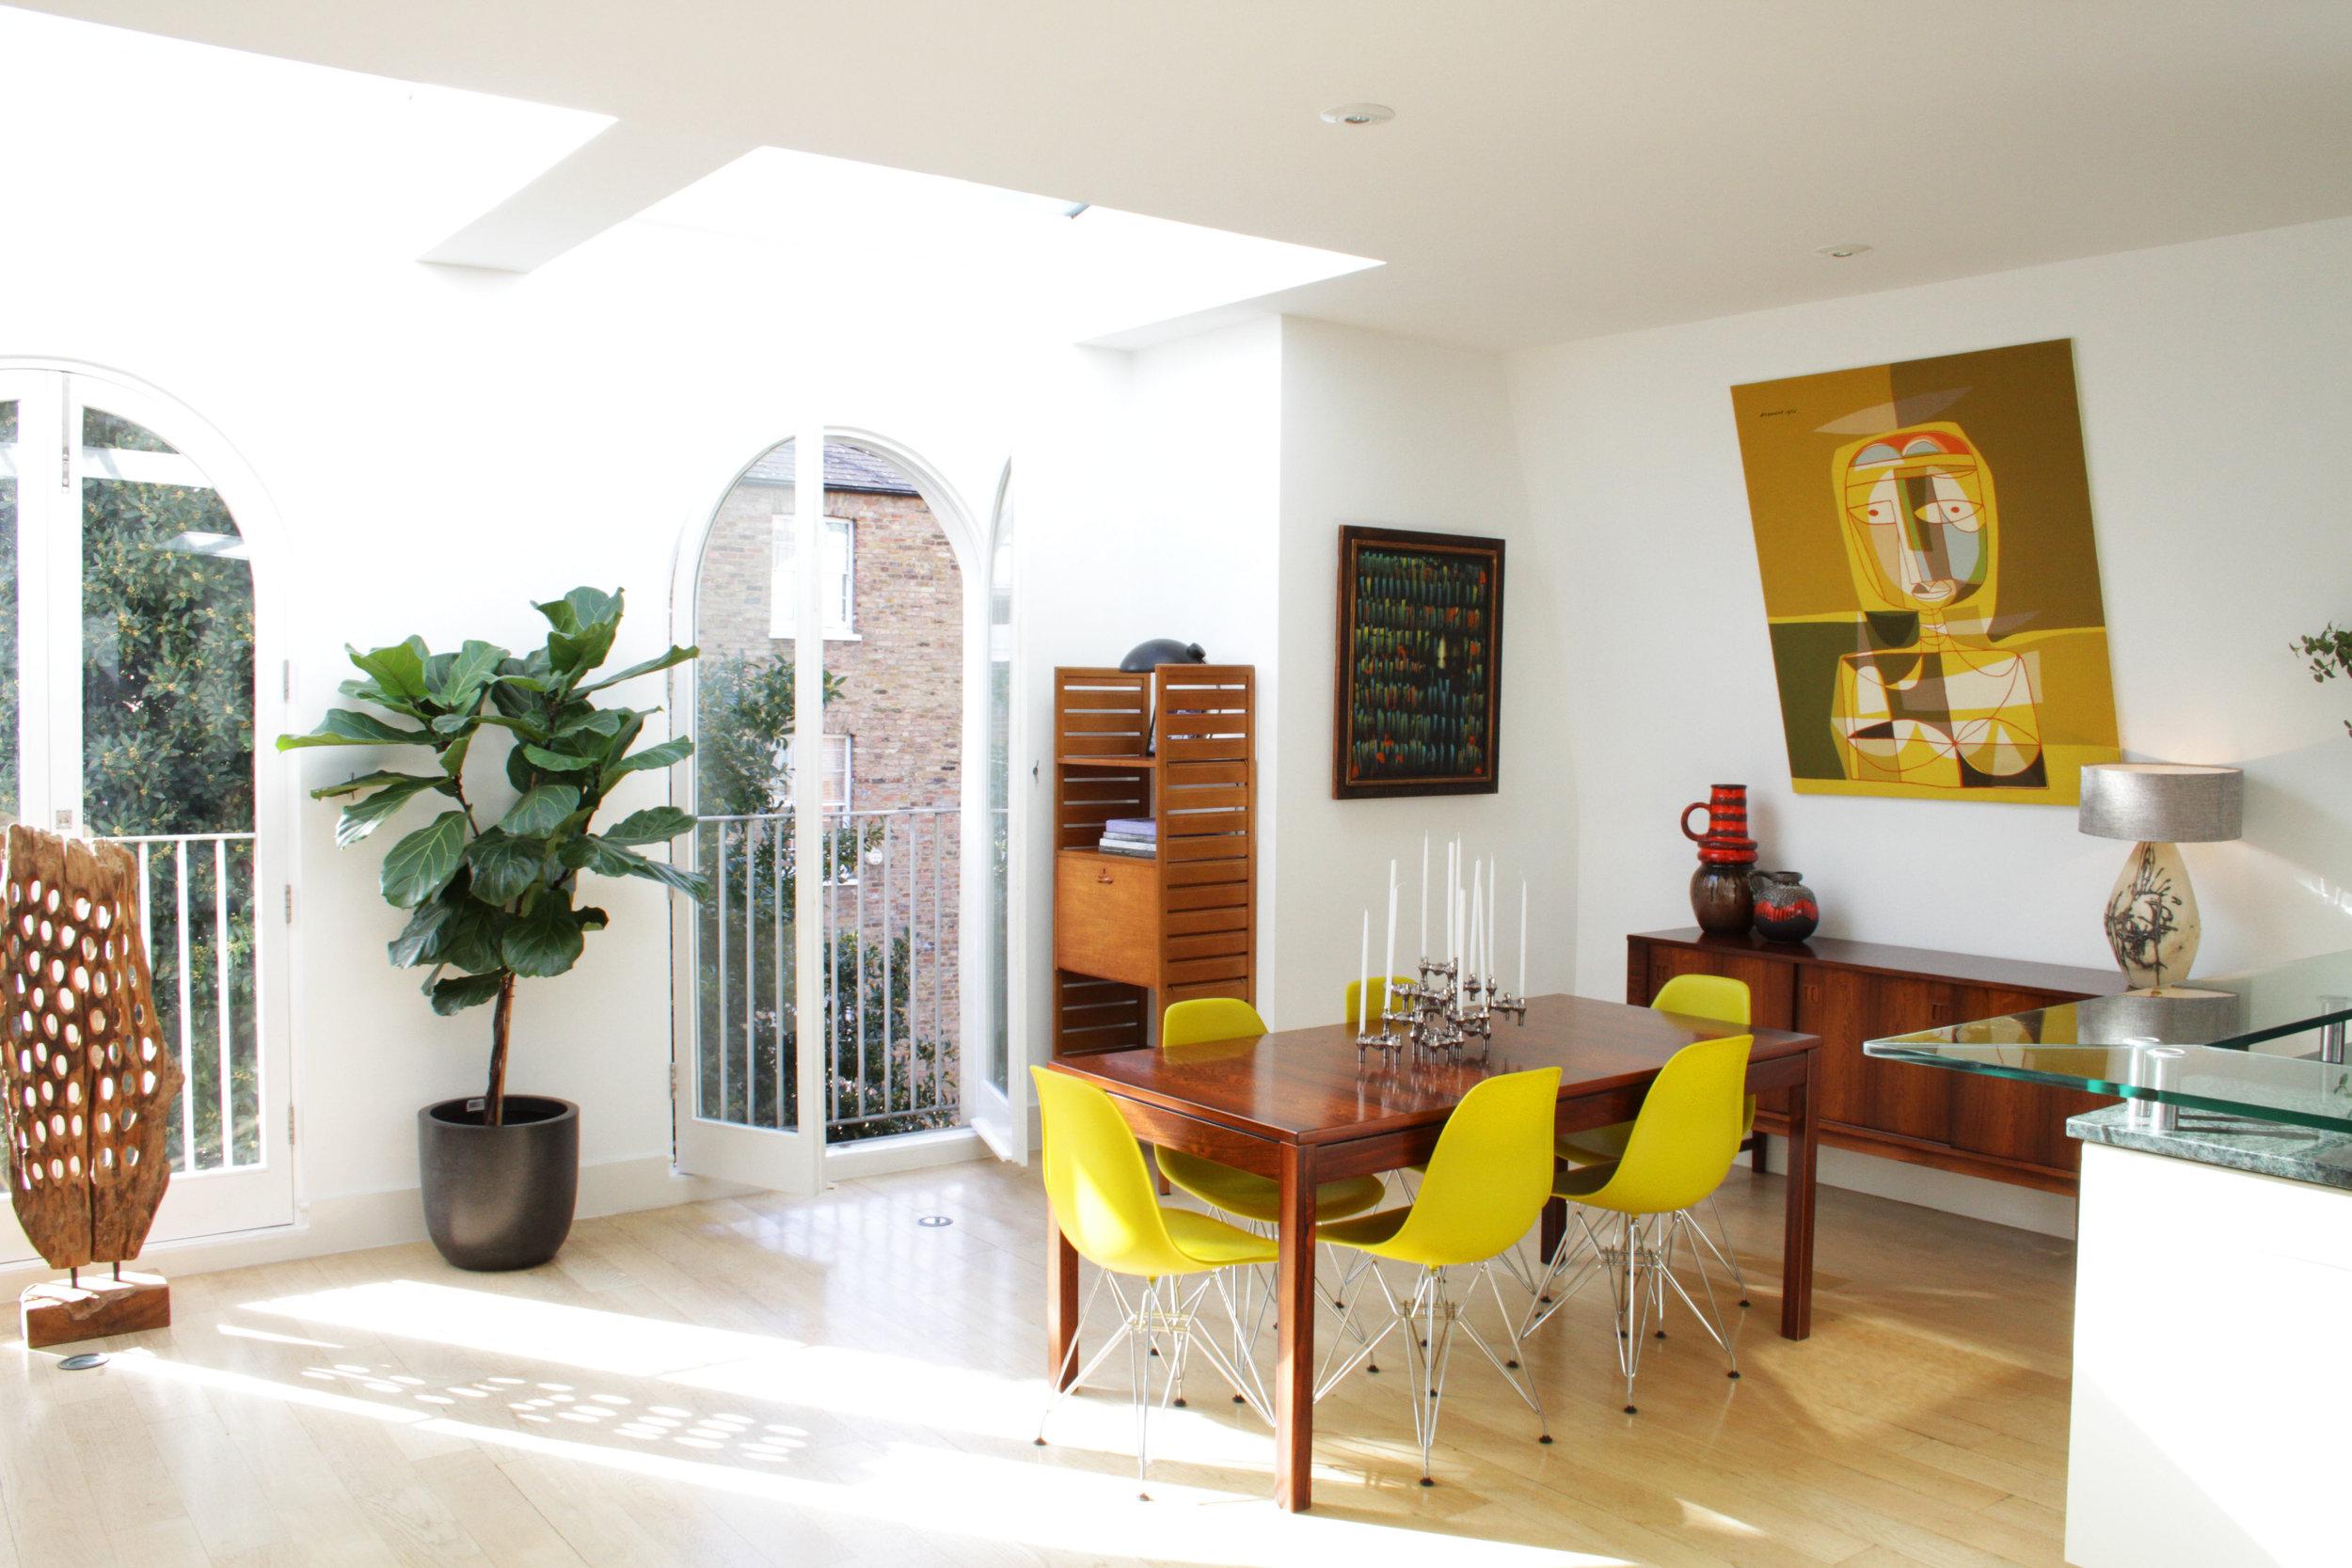 Interior Shoot in collaboration with Room Service Brighton